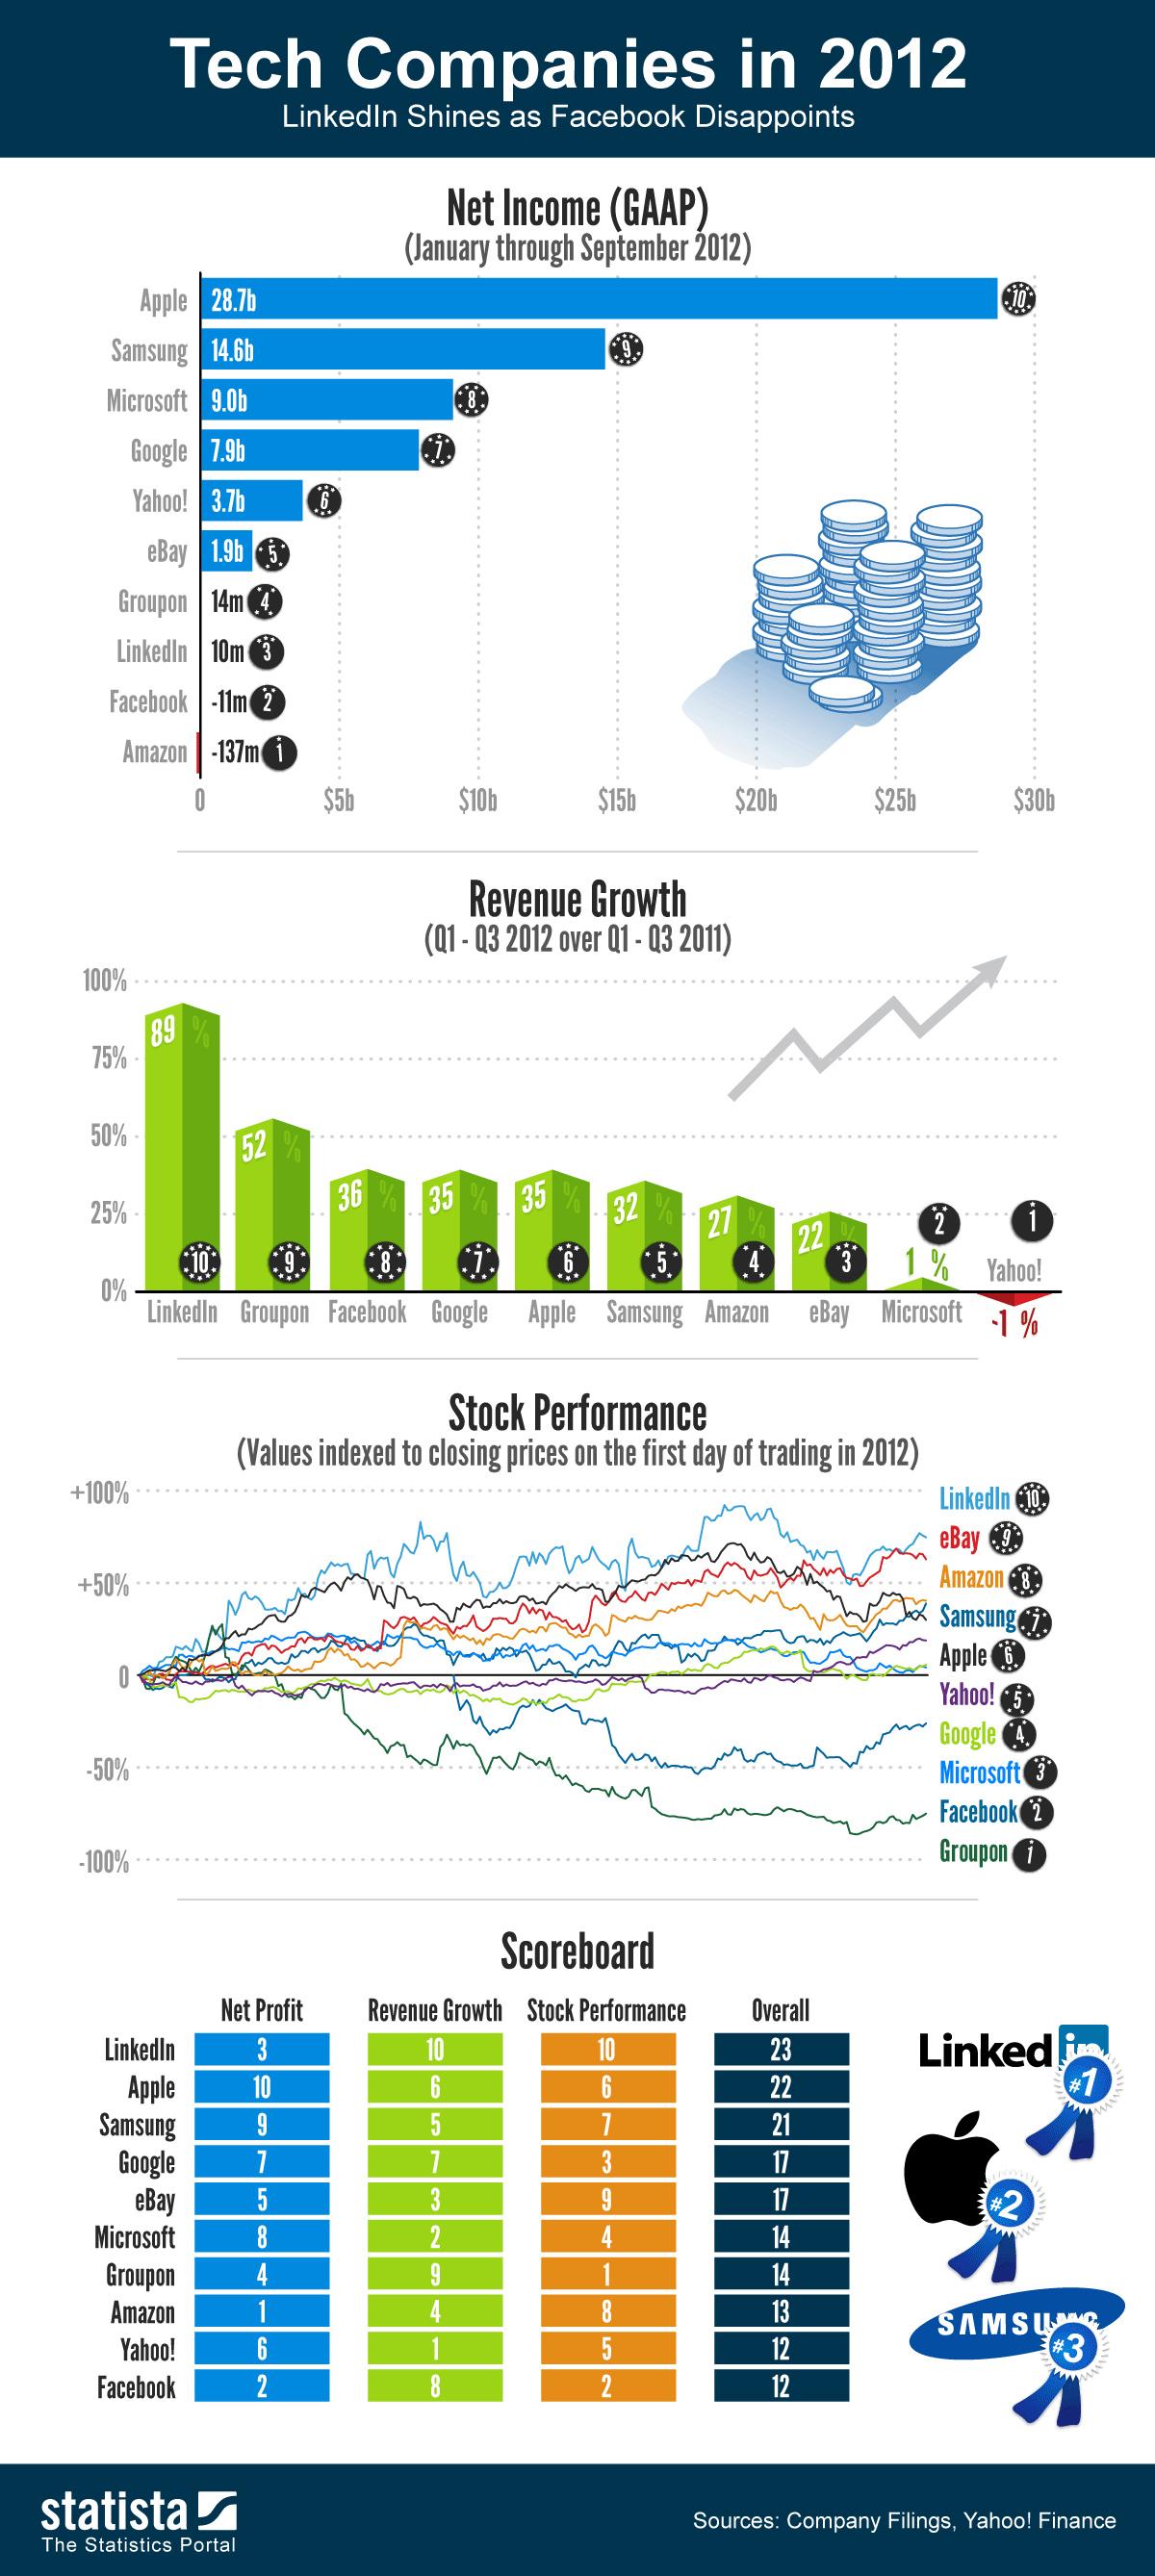 1statista-tech-companies-2012-infographic